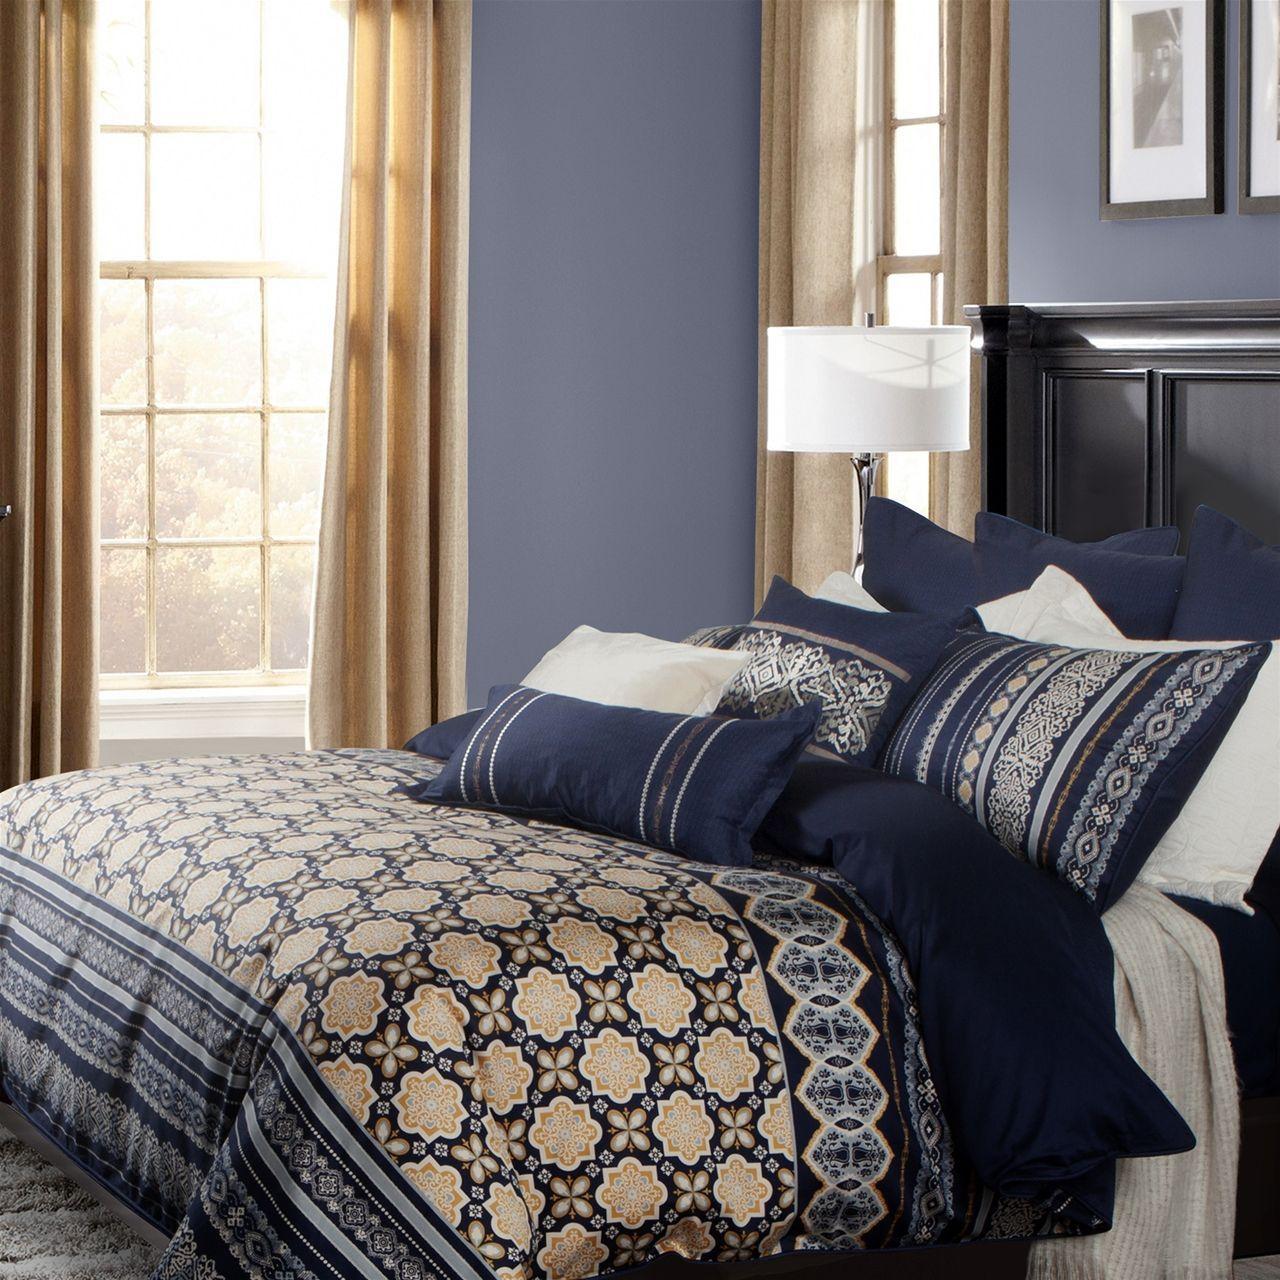 Designer Linen Designer Bedding Sorrento Collection Bedding Duvet Cover Luxury Bedding Duvet Luxury Bedding Bedding Master Bedroom Blue And Gold Bedroom